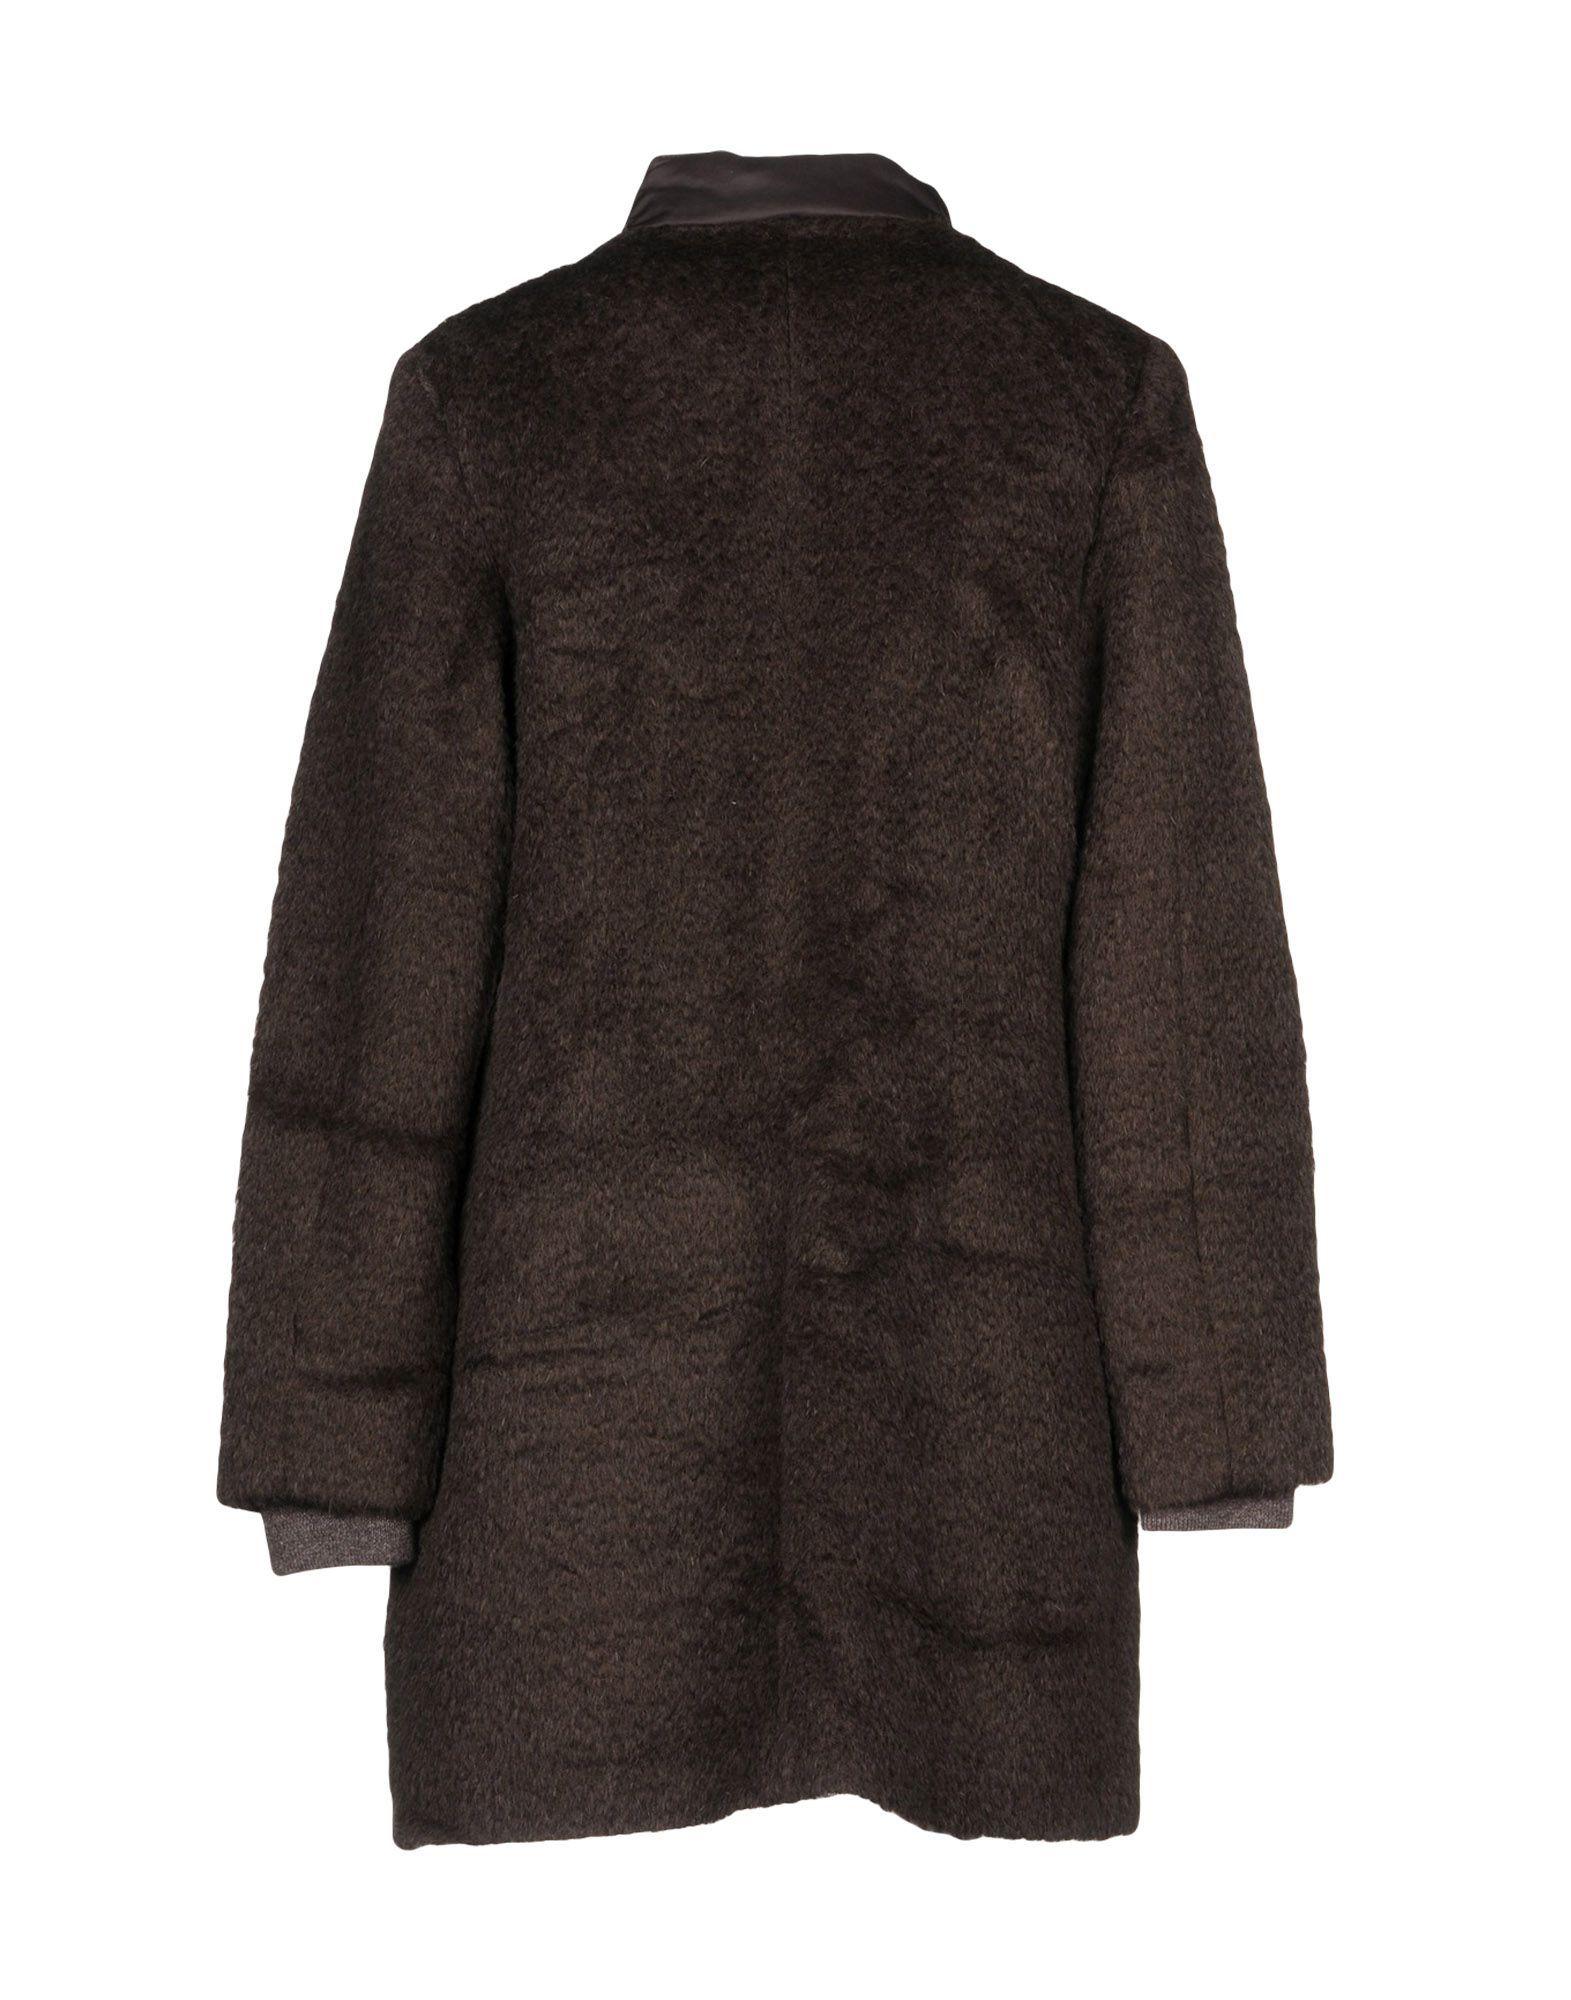 Coat & Jackets Gran Sasso Cocoa Women's Virgin Wool